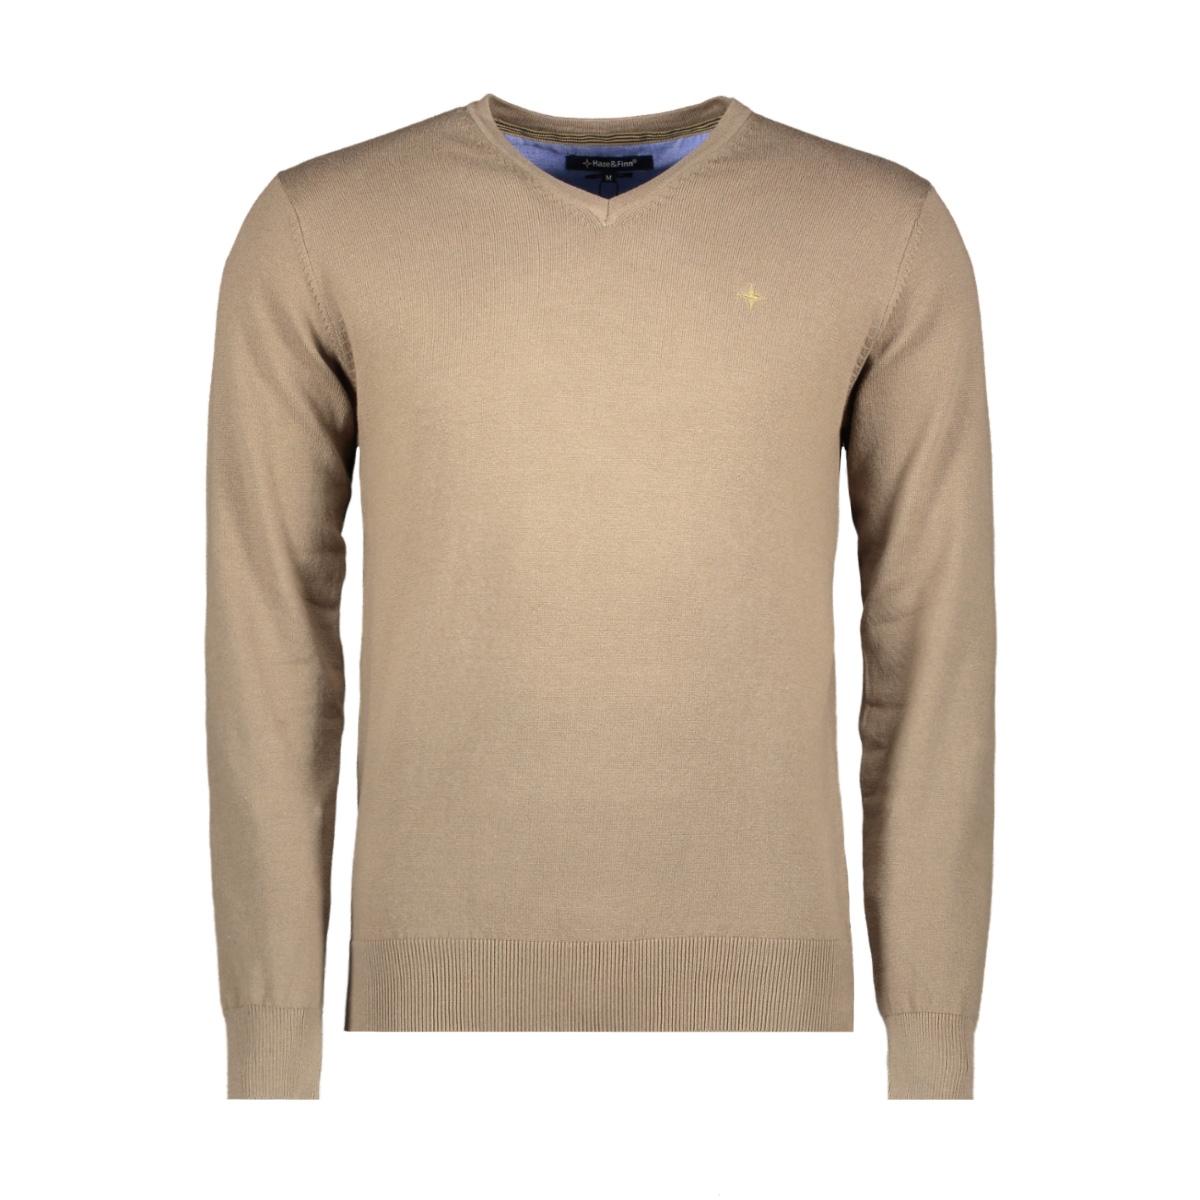 mc10-0200 haze & finn sweater stone